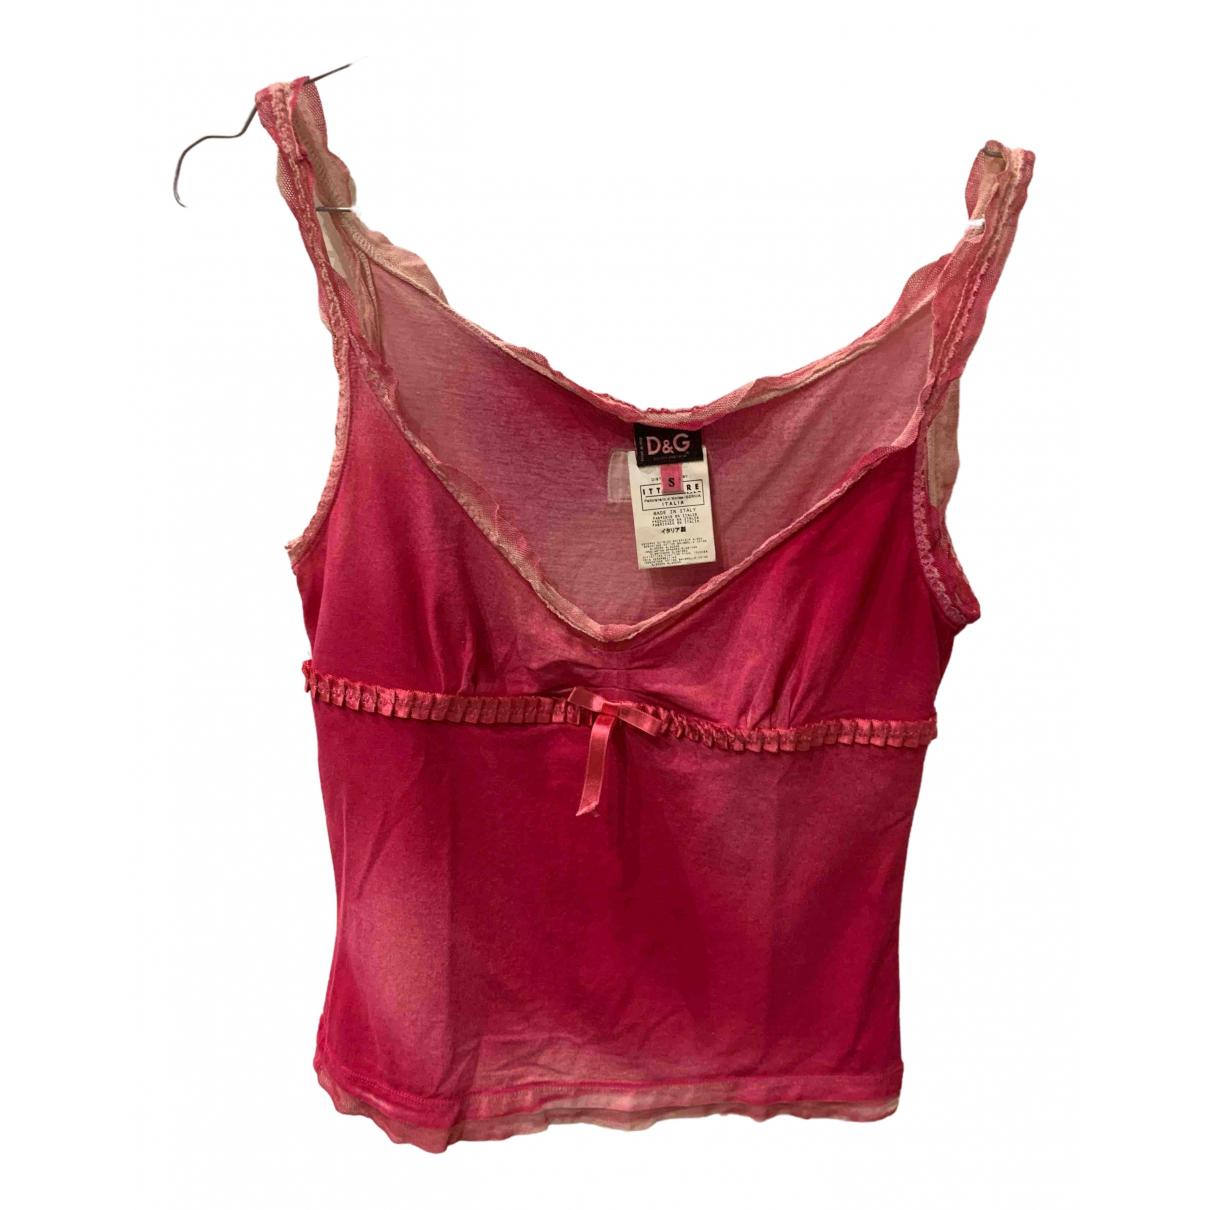 D&g \N Pink Cotton  top for Women S International